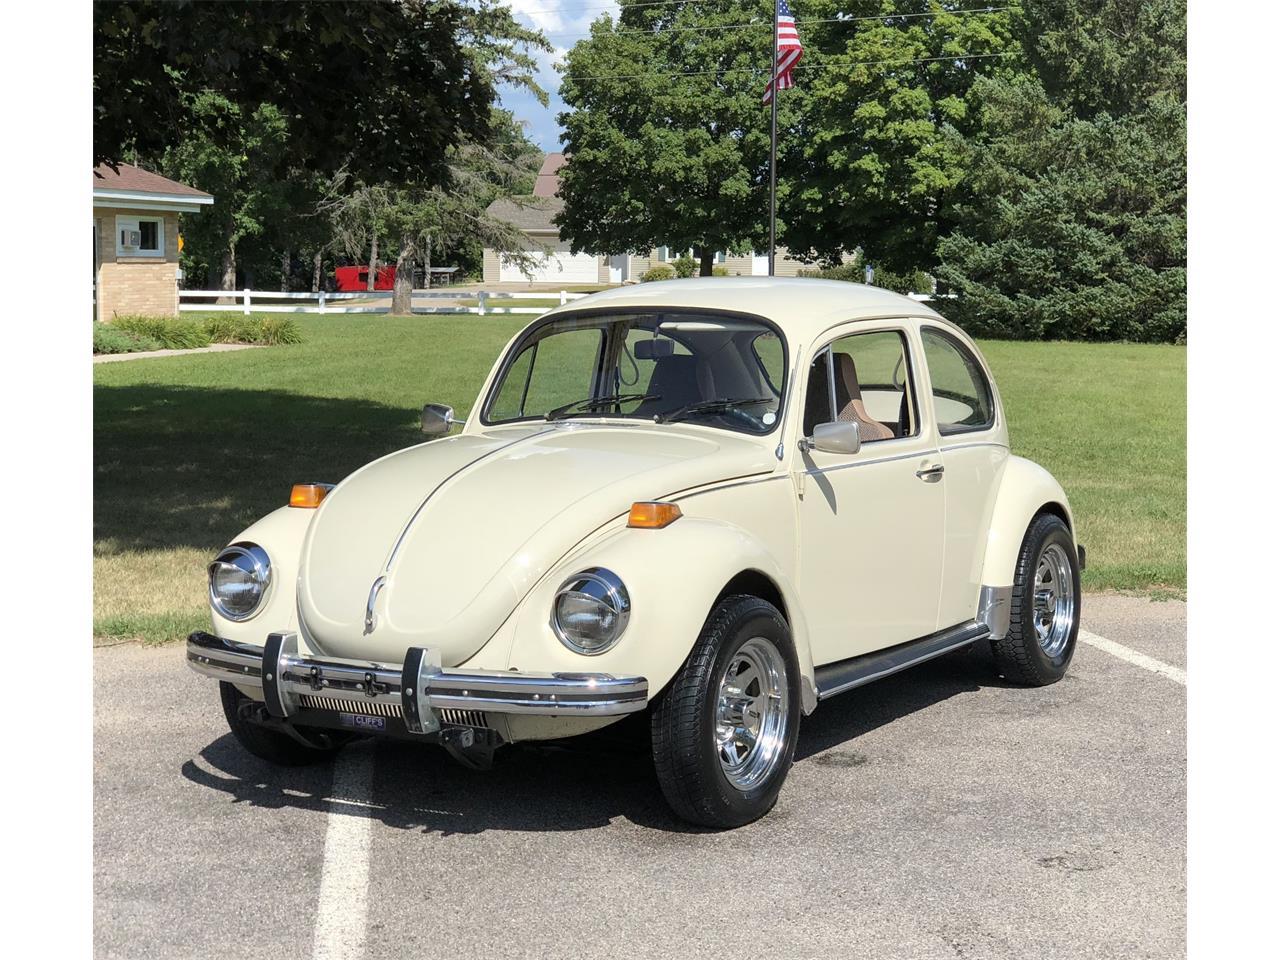 1971 Volkswagen Beetle For Sale Classiccars Com Cc 1130661